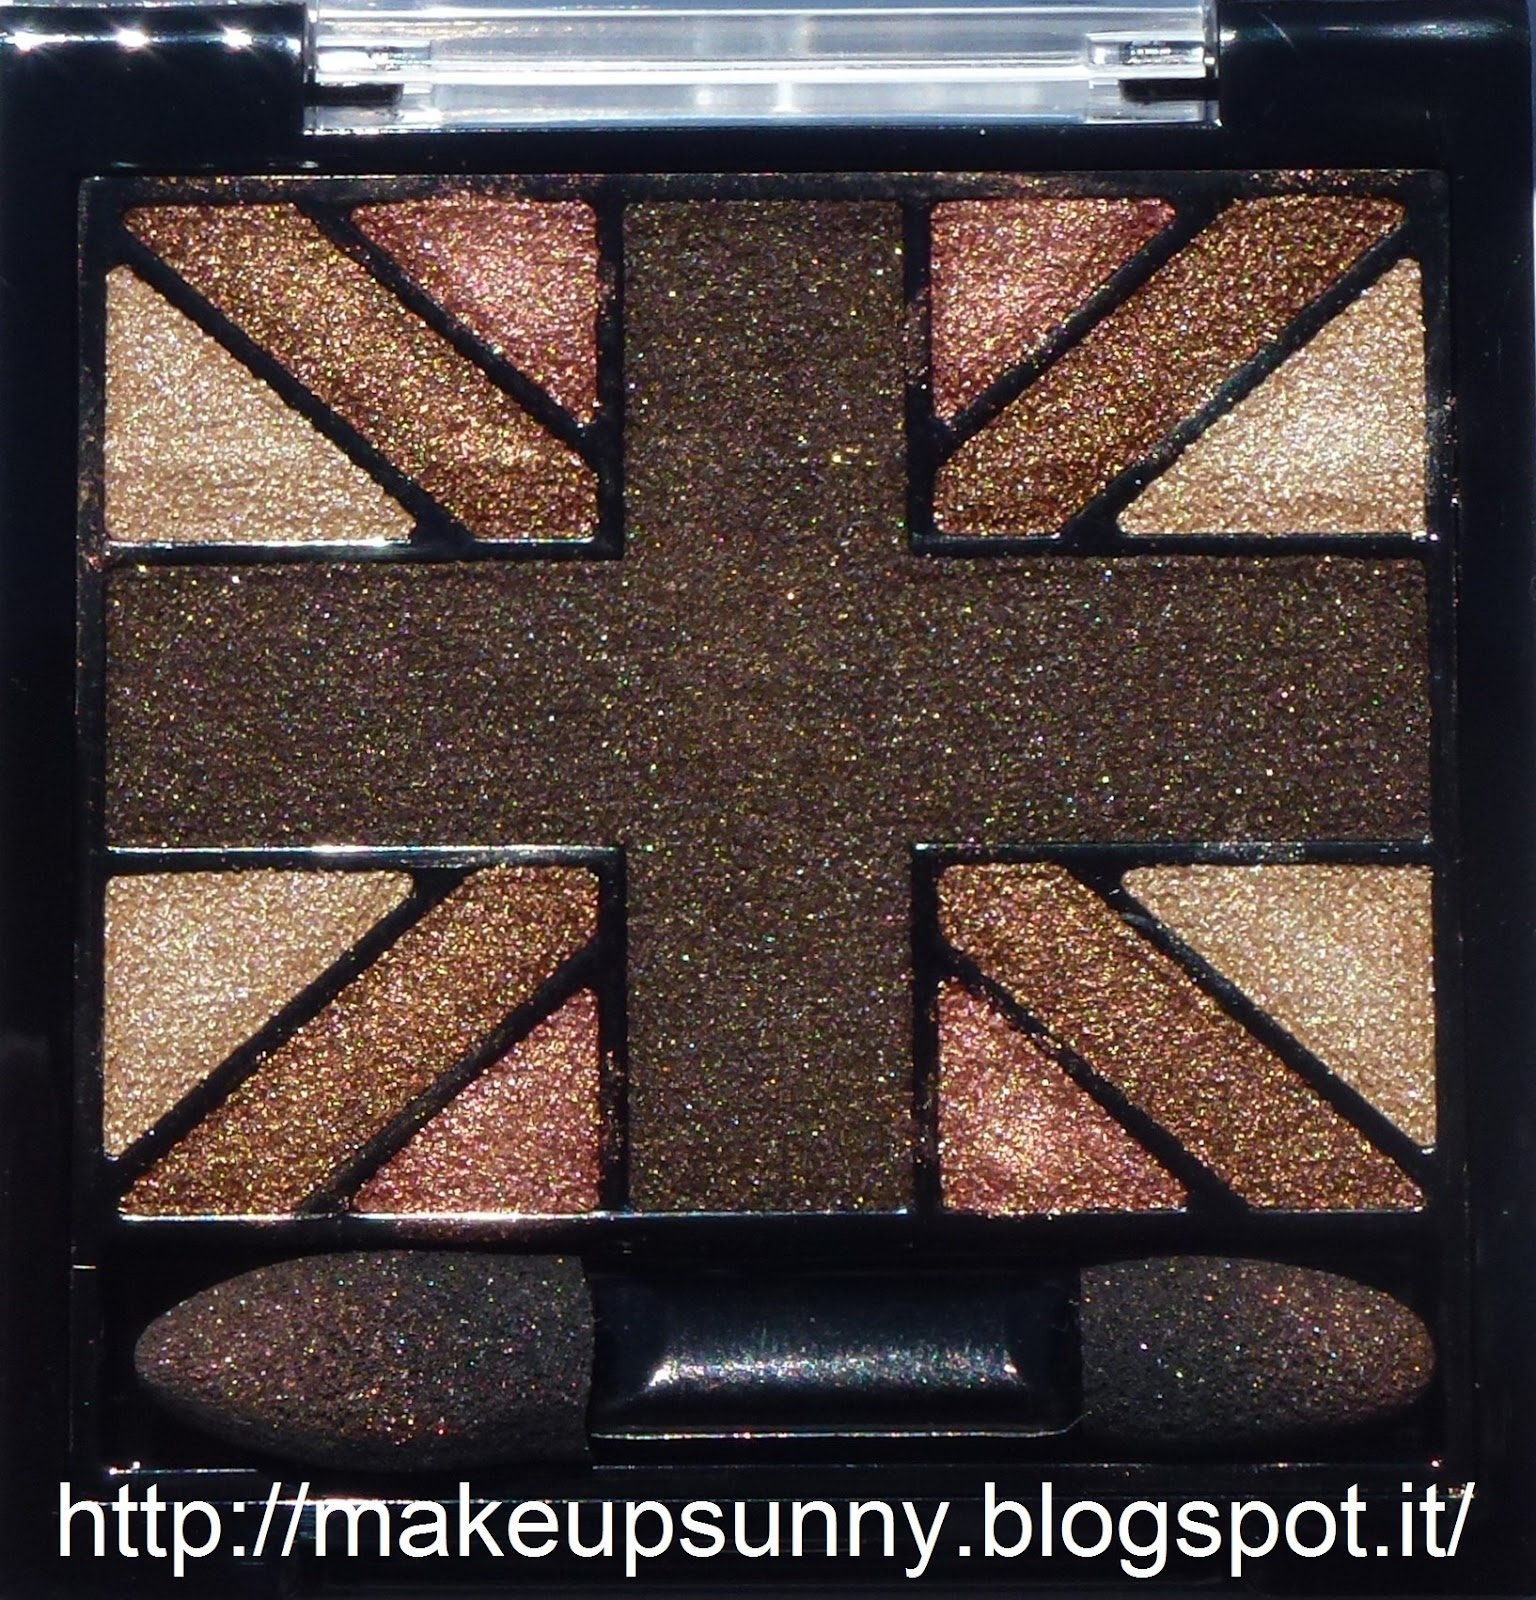 http://3.bp.blogspot.com/-8uqQF6Q2yls/T4QXHKvyD_I/AAAAAAAADEA/c7-ktTilhOc/s1600/rimmel+london+kate+moss+collection+glam+eyes+hd+union+jack+palette+ombretti+eyeshadow+02+english+oak+marrone+pesca.JPG